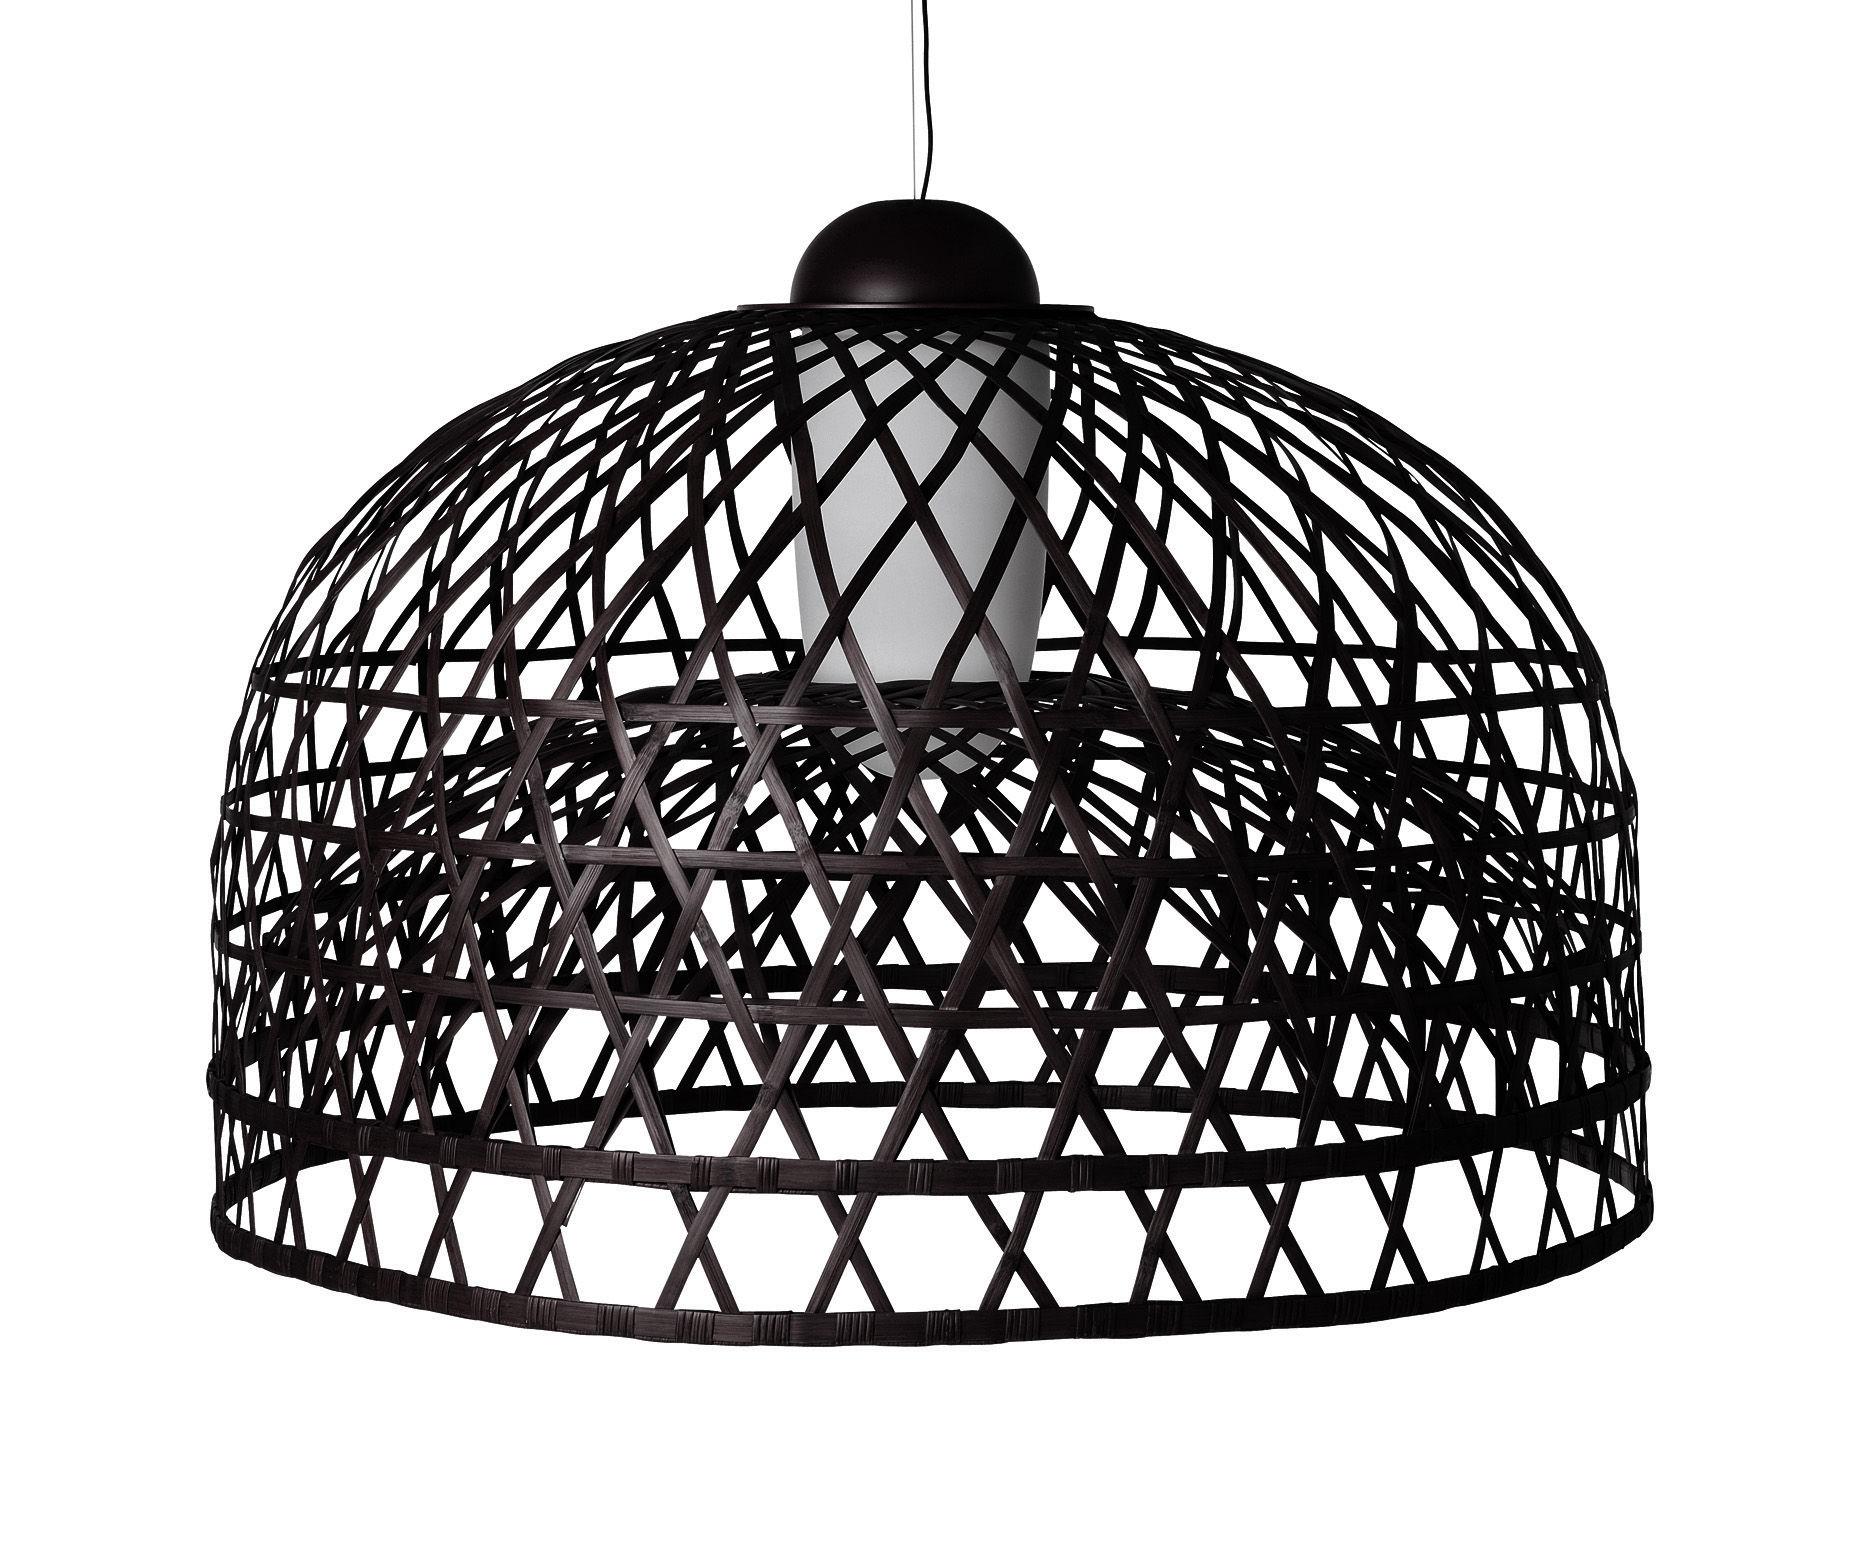 Lighting - Pendant Lighting - Emperor Pendant - Large by Moooi - Ø 160 cm - Black - Aluminium, Rattan